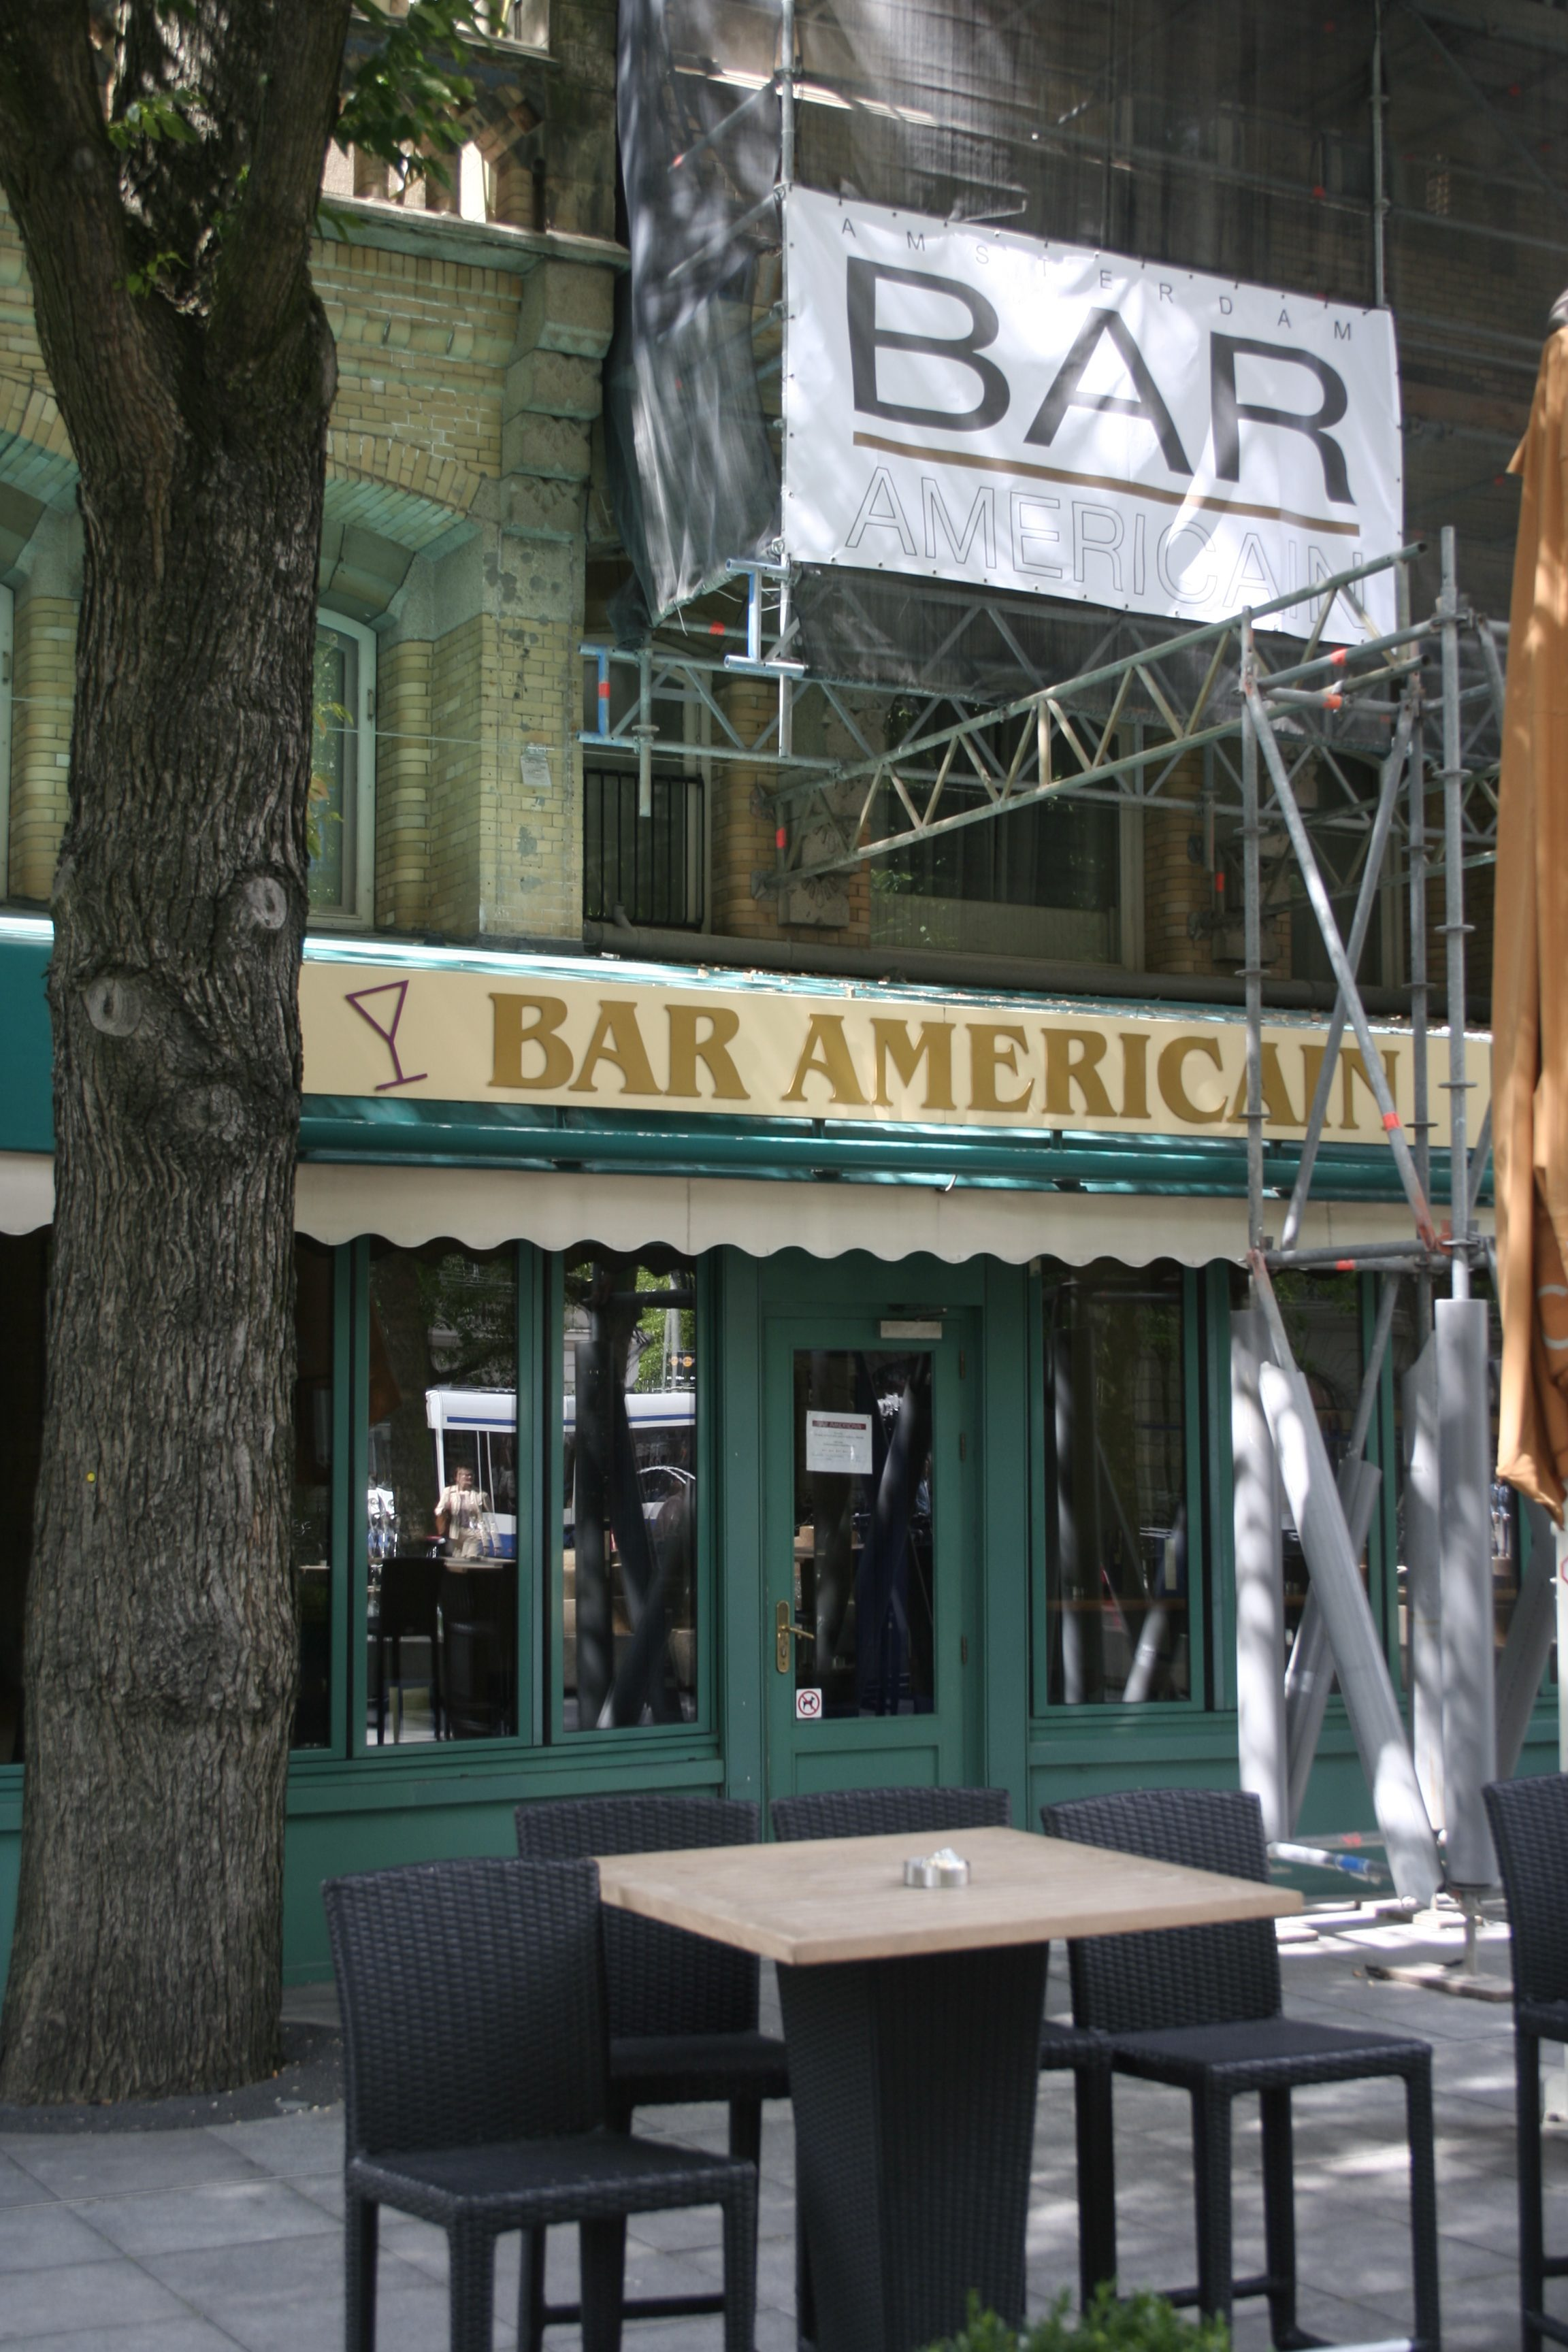 Amsterdam-Bar Americain